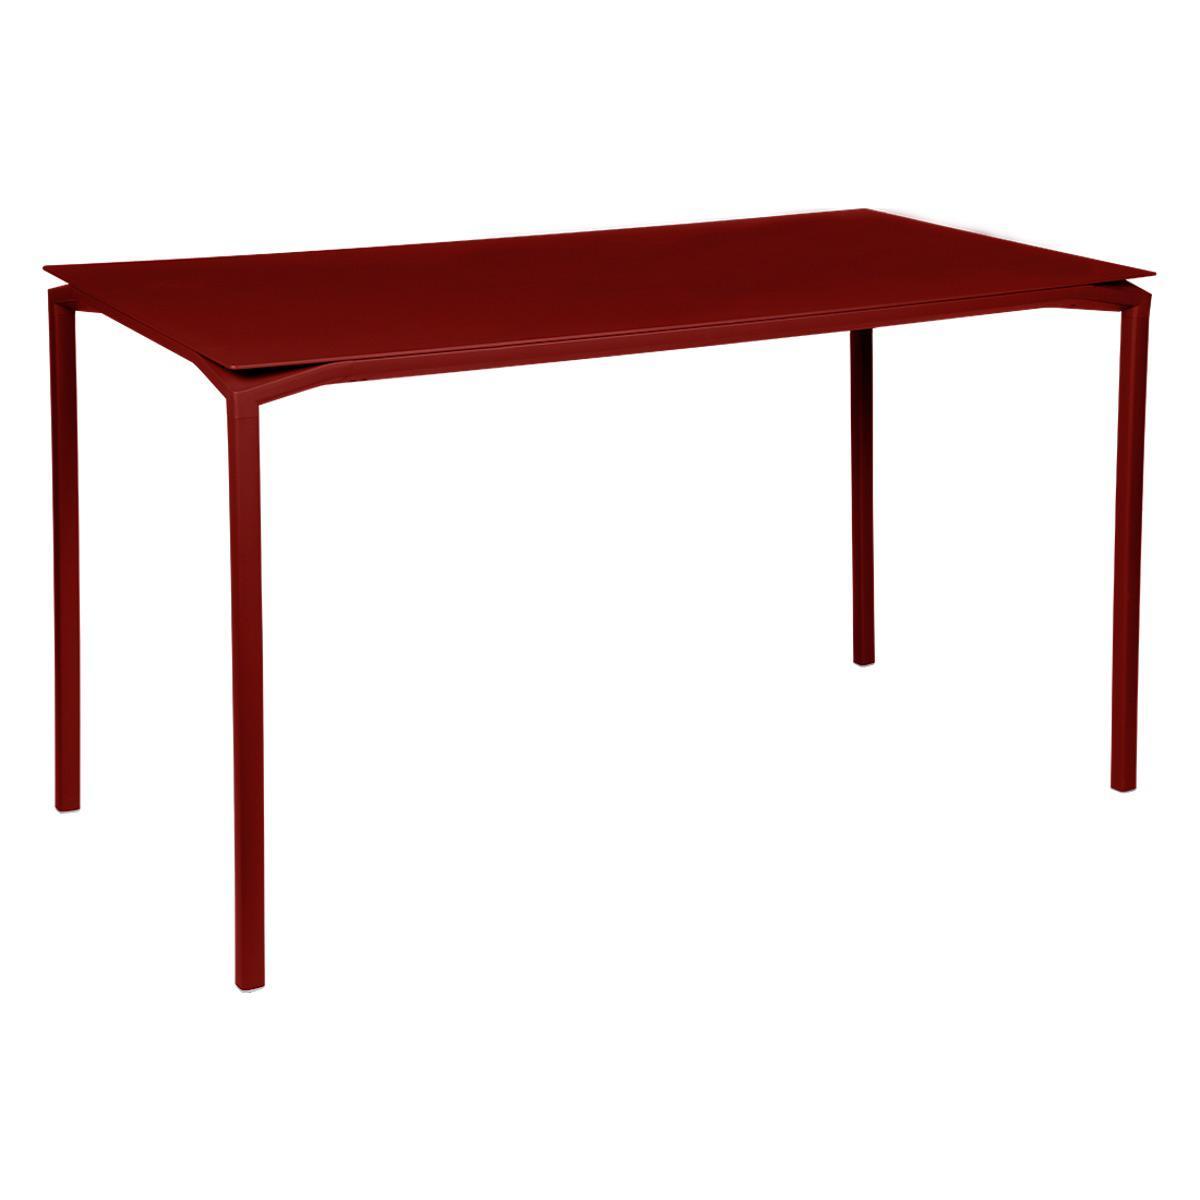 Table 80x160cm CALVI Fermob piment